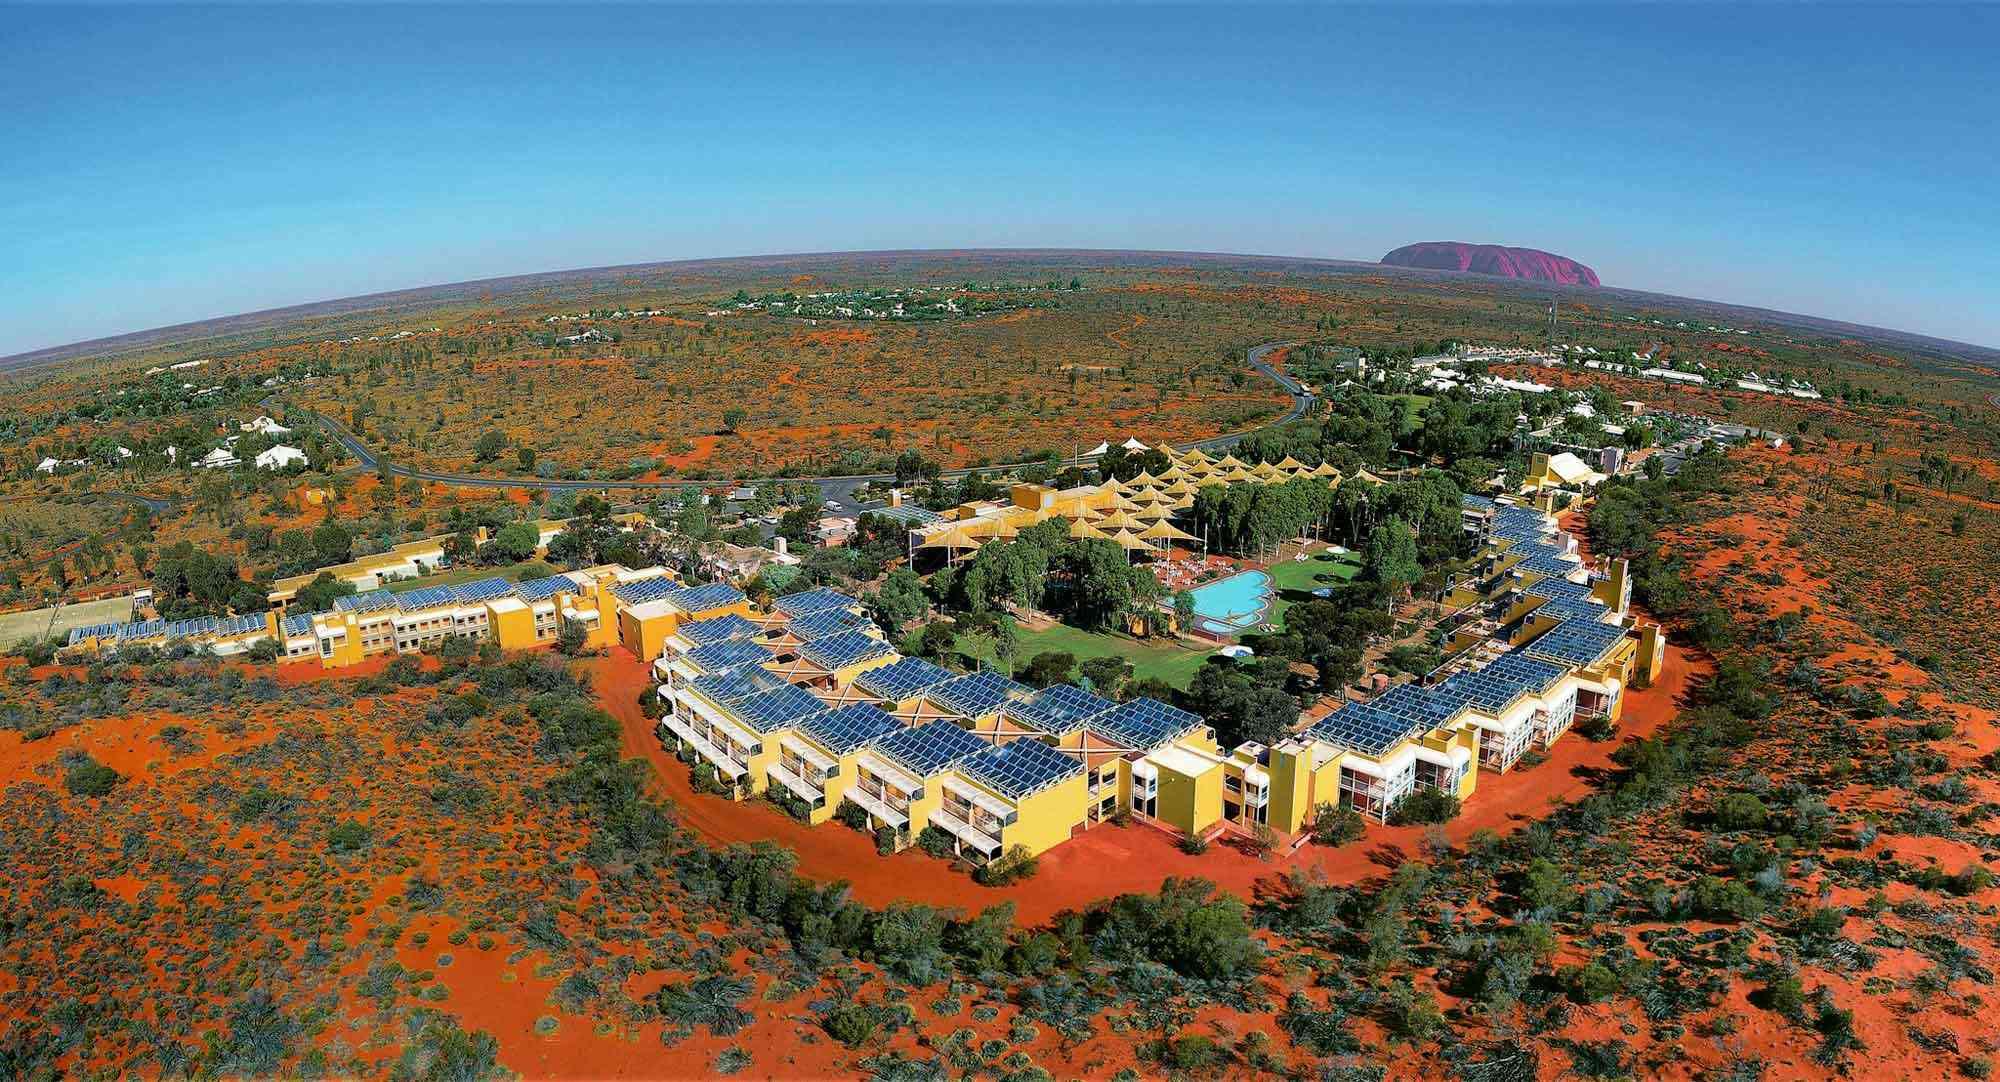 Ayers Rock Uluru hotel Sails in the Desert view